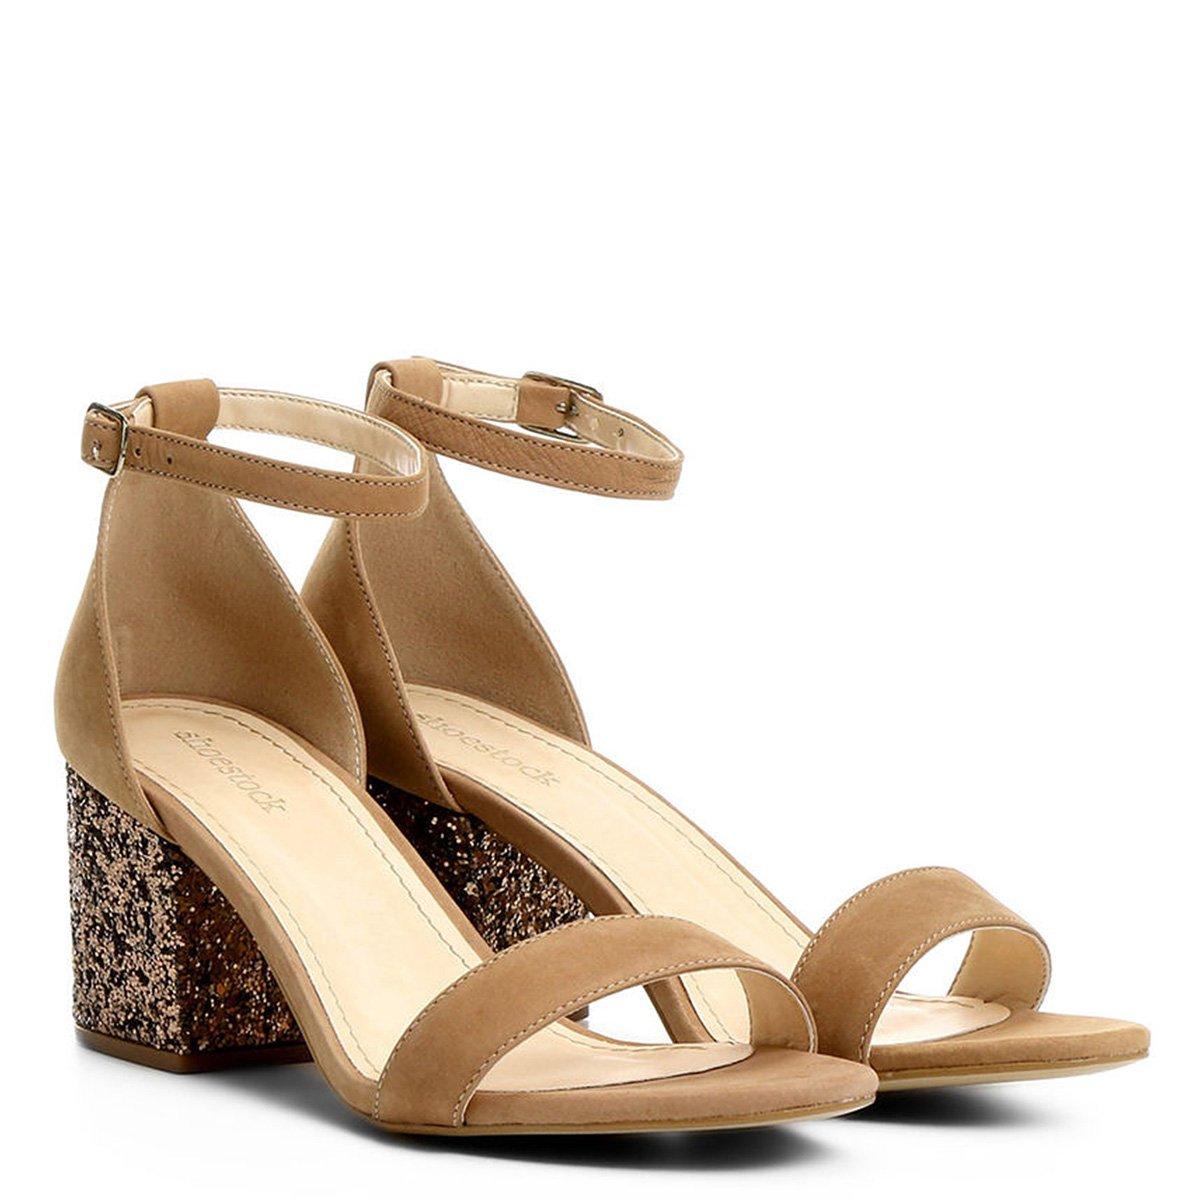 a439ed25d Sandália Shoestock Salto Médio Glitter | Shoestock